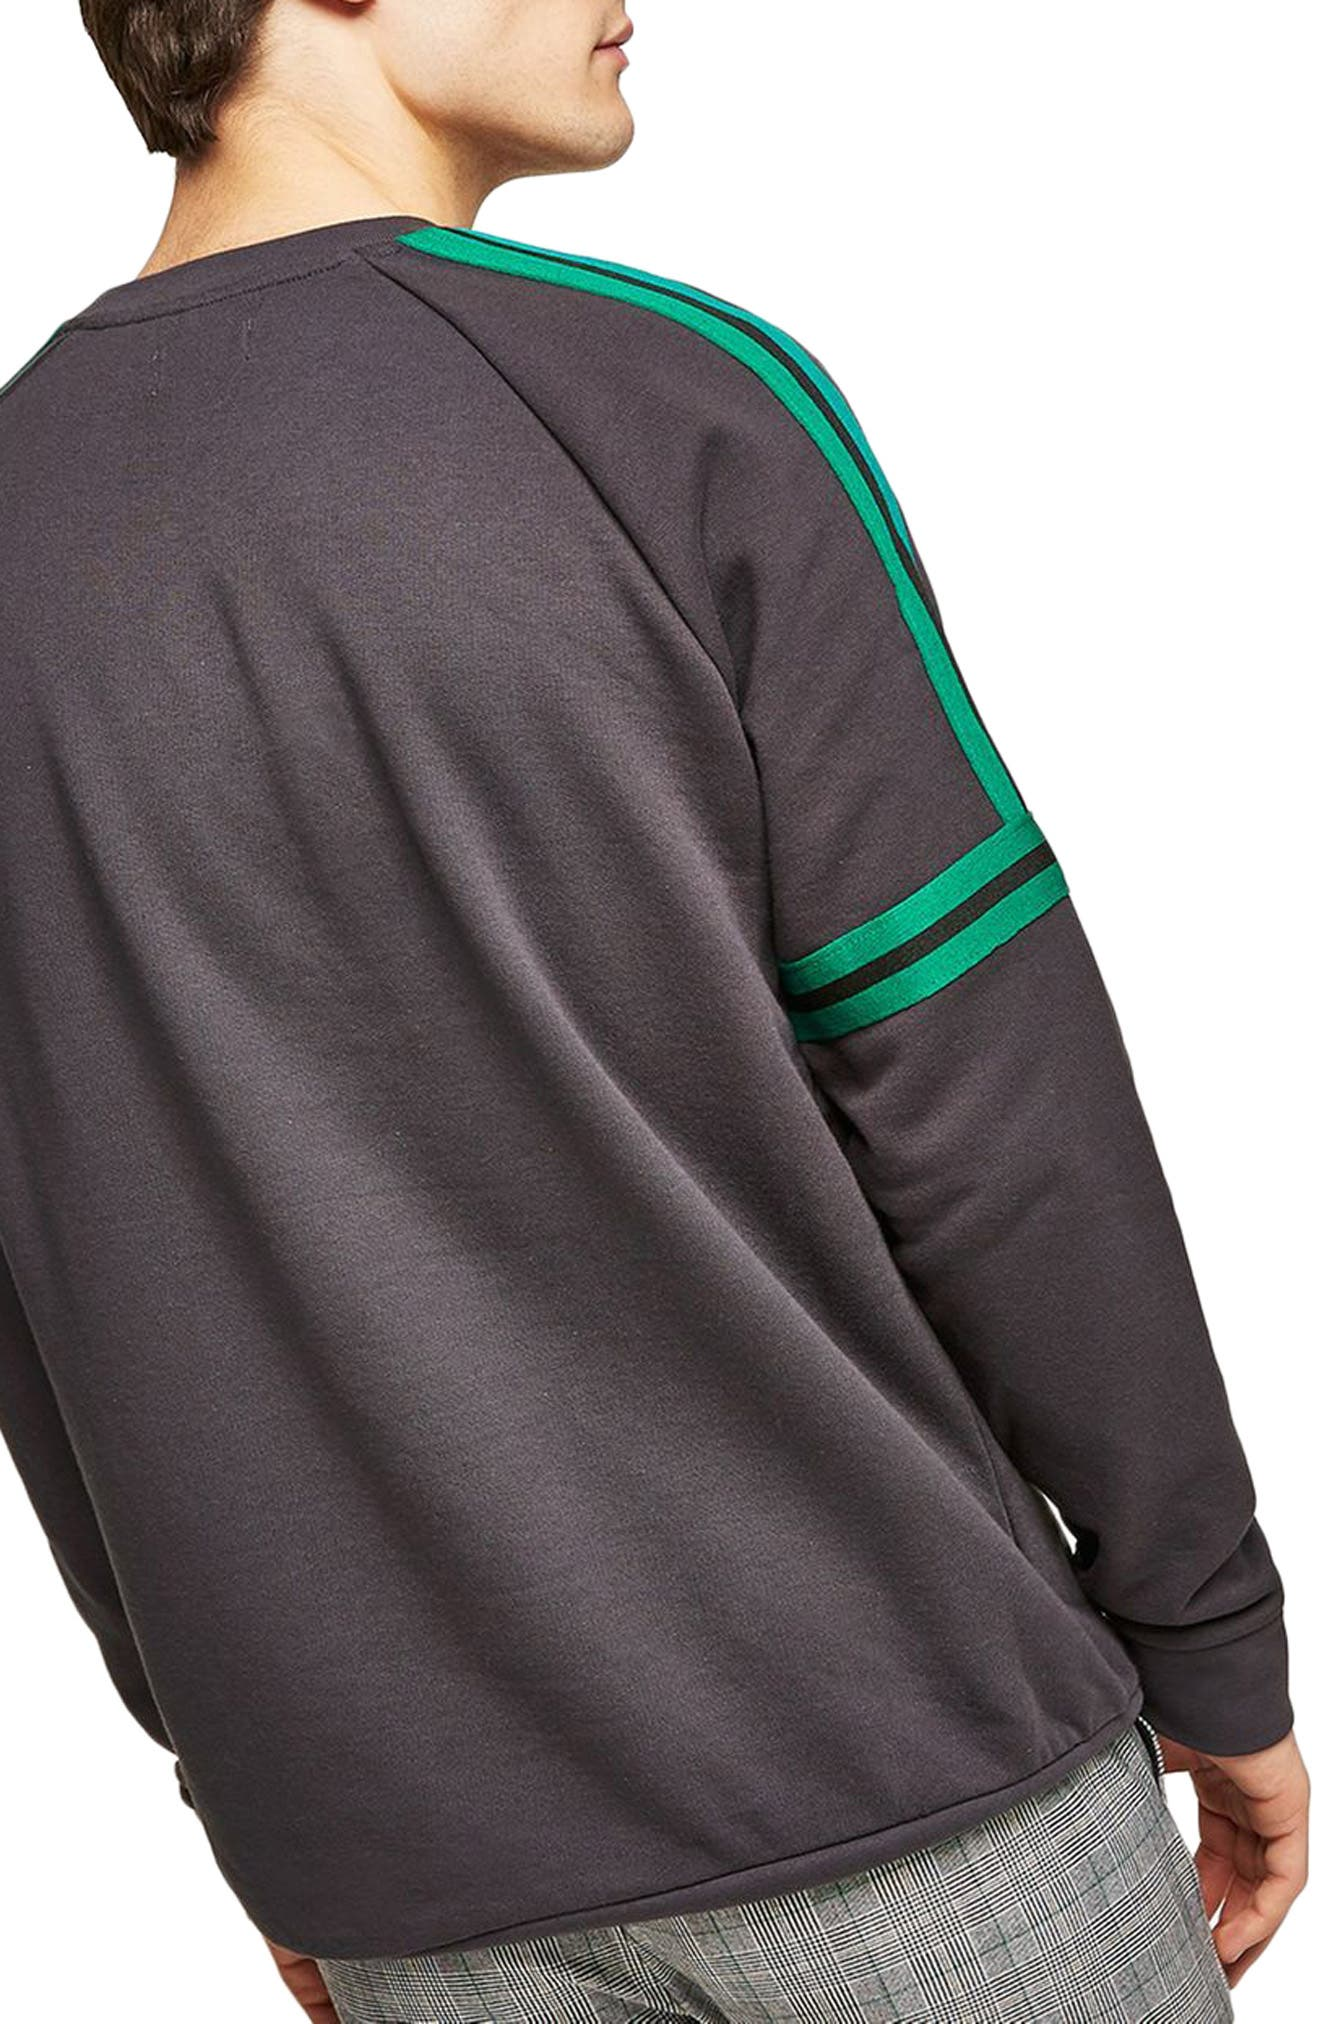 Tape Crewneck Sweatshirt,                             Alternate thumbnail 2, color,                             Grey Multi